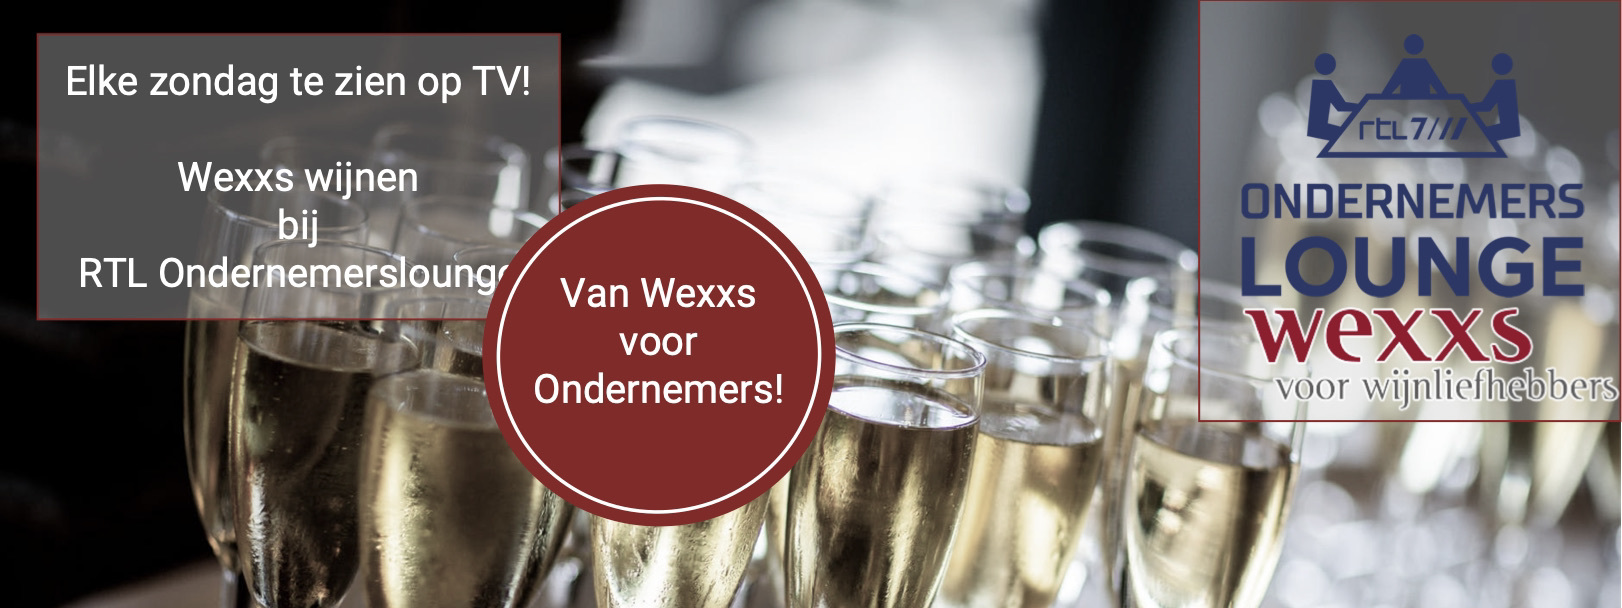 rtl7 ondernemerslounge Wexxs wijnen